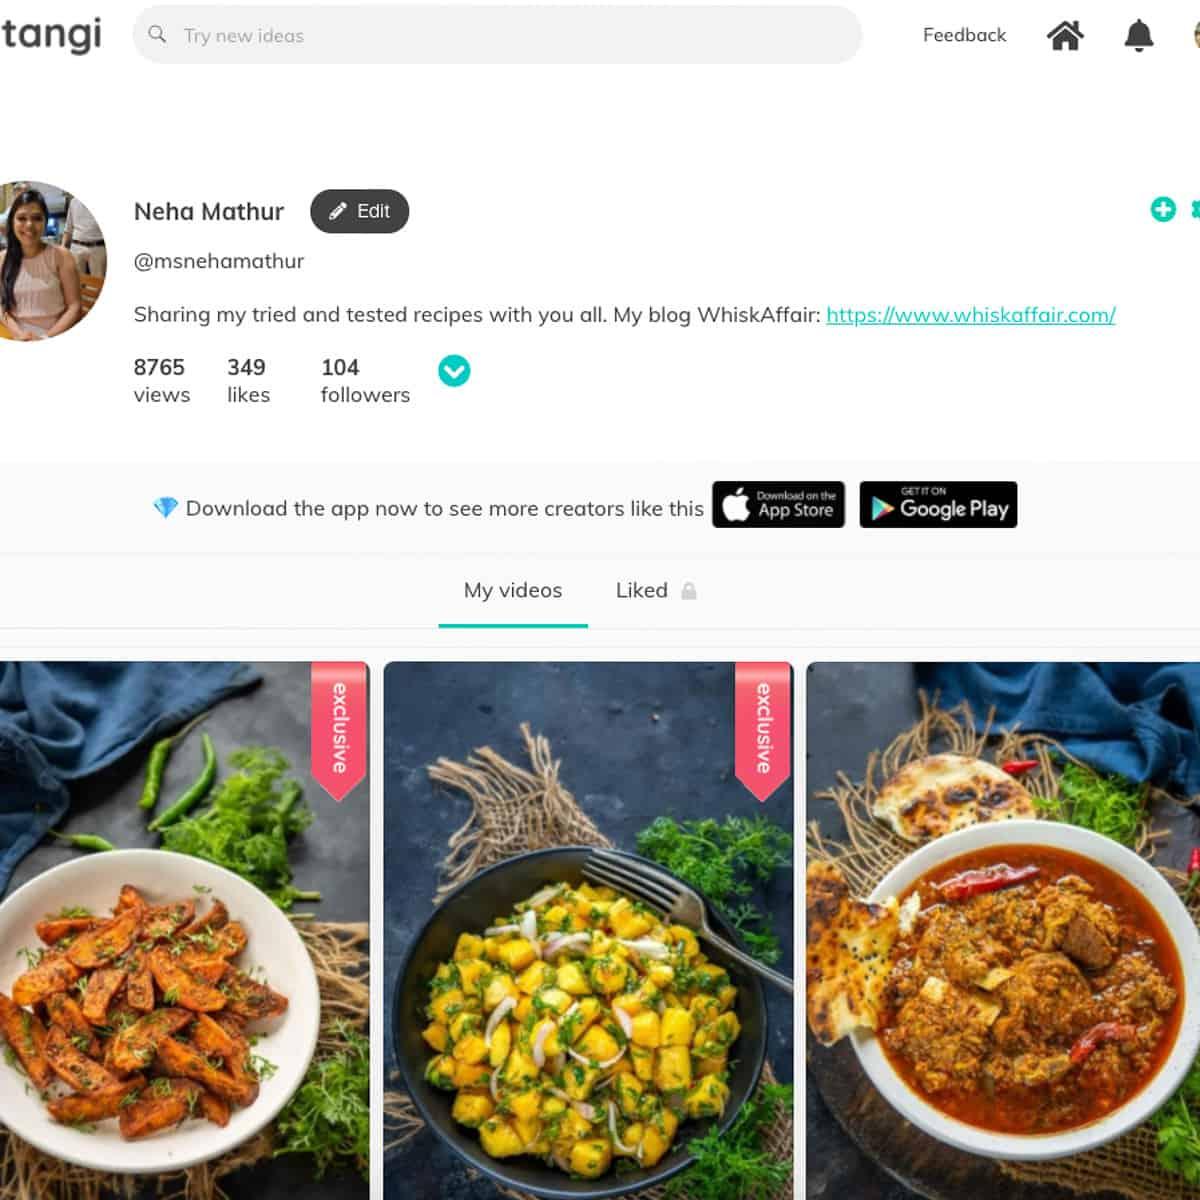 Tangi profile screen shot.